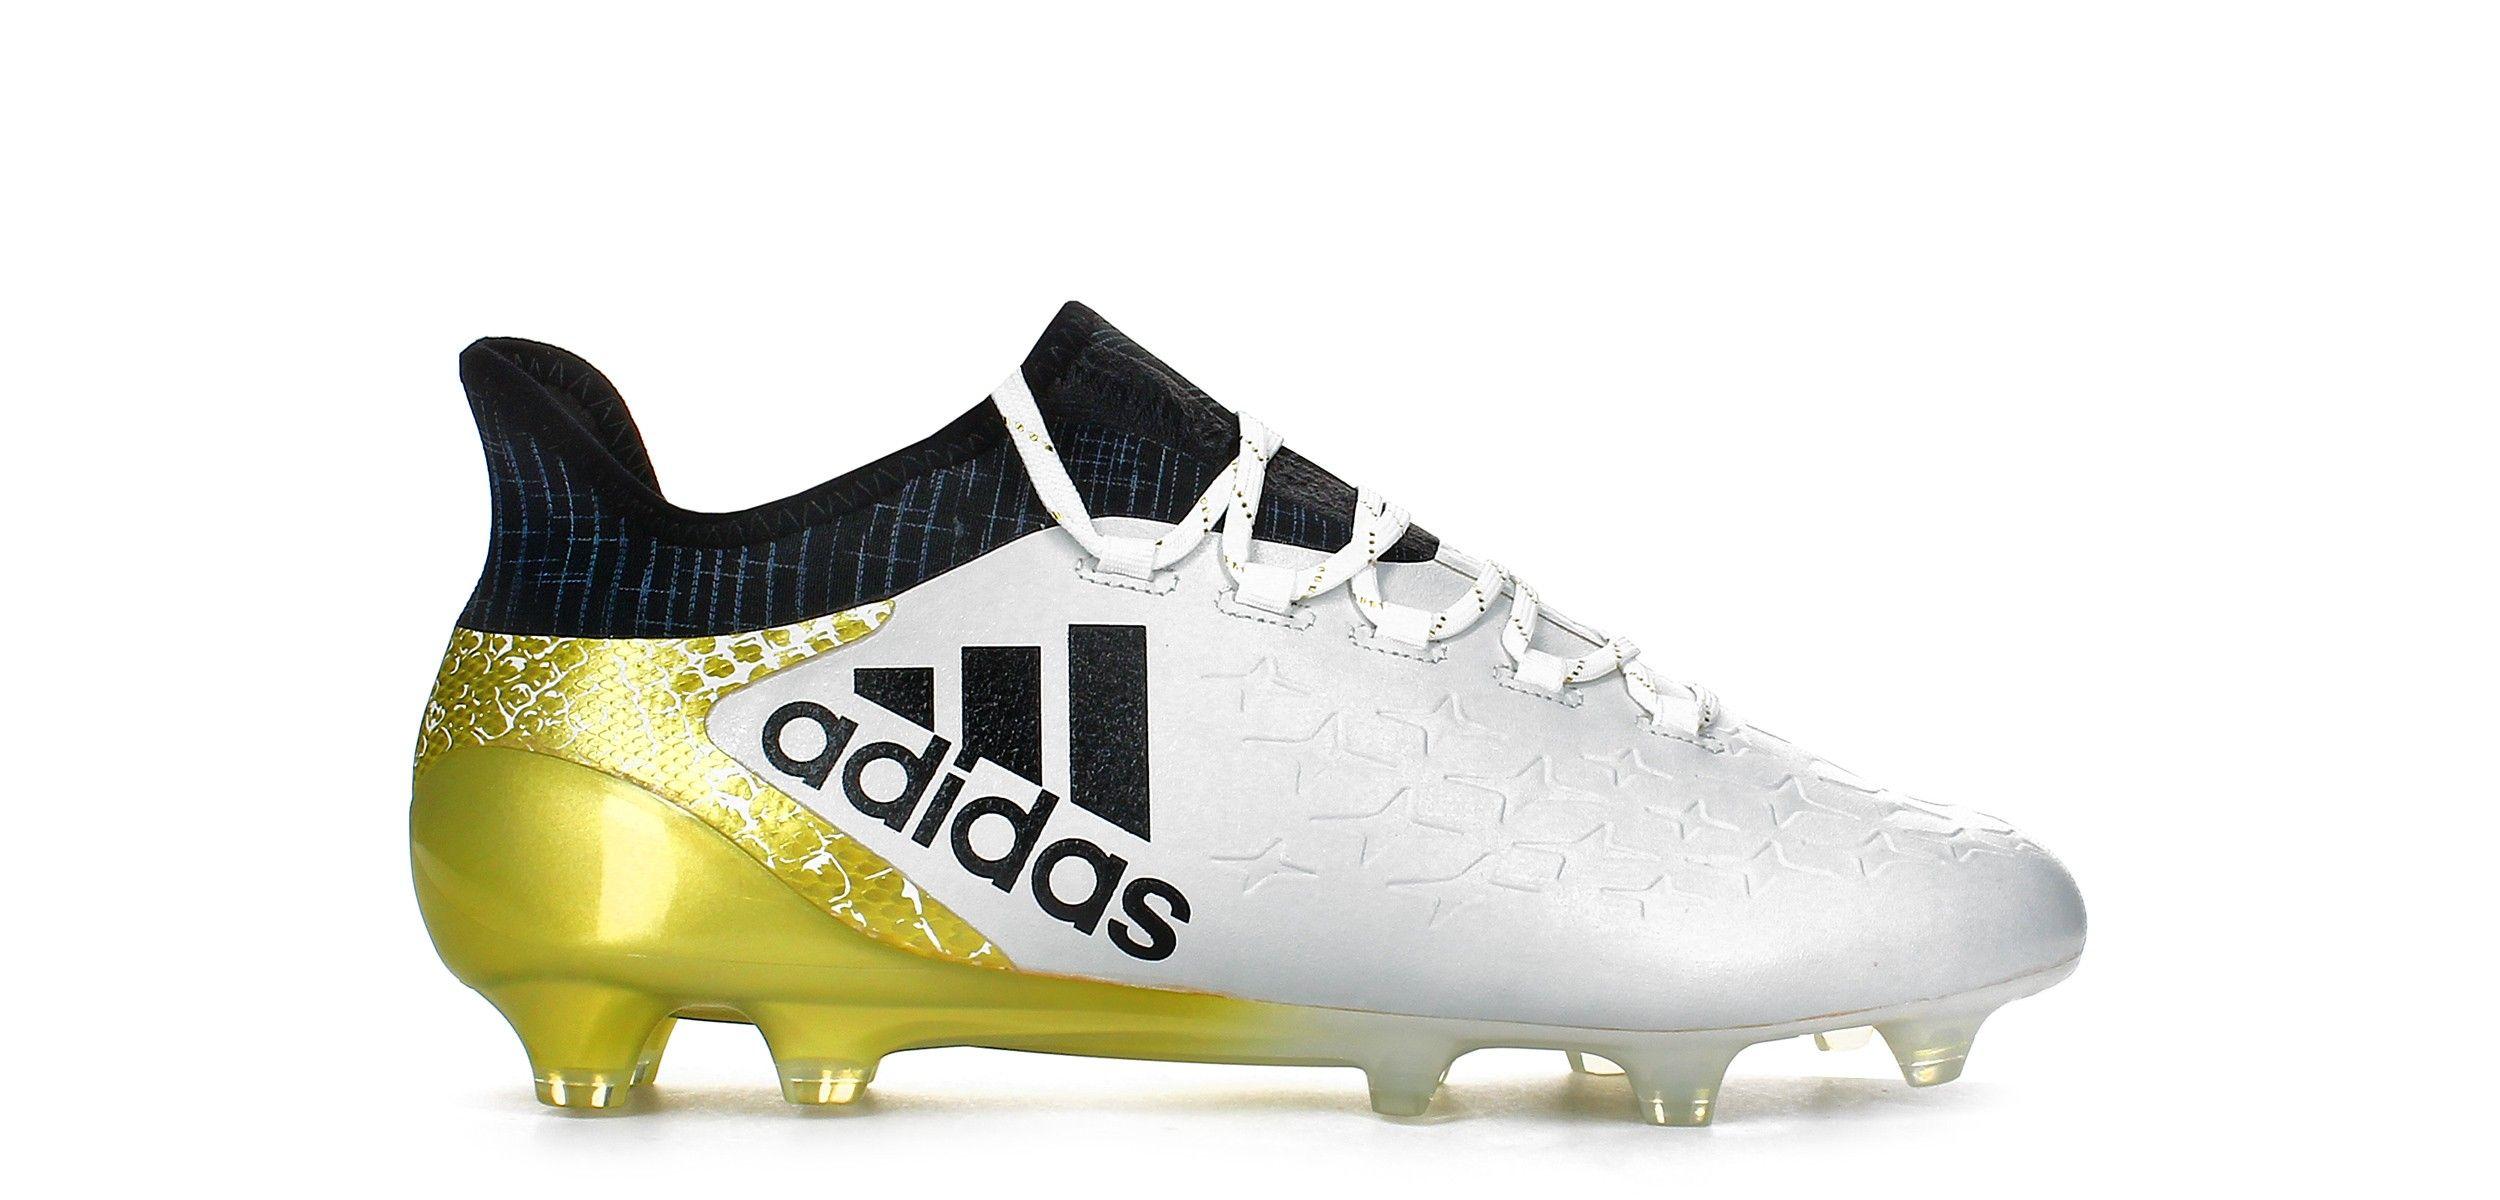 new style d2a39 a802c Botas de fútbol adidas X 16.1 FG - Blanco   Negro   Dorado - Exterior pie  derecho